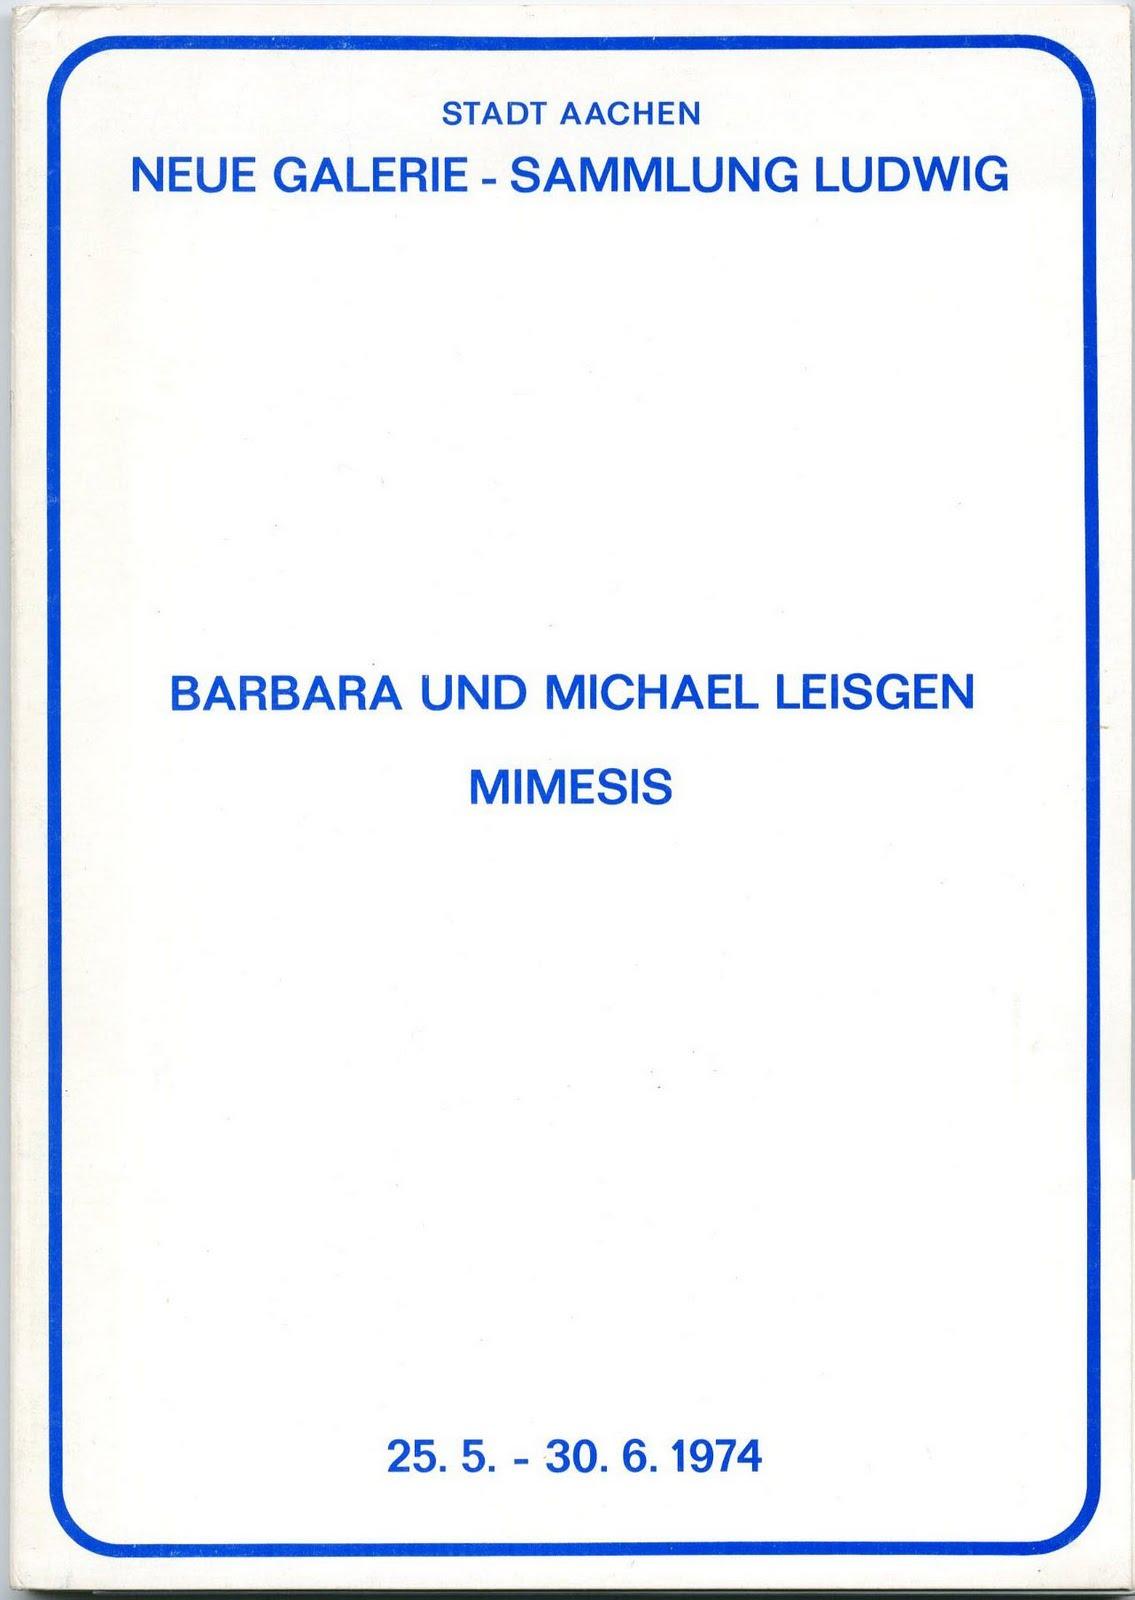 barbara-and-michael-leisgen-mimesis